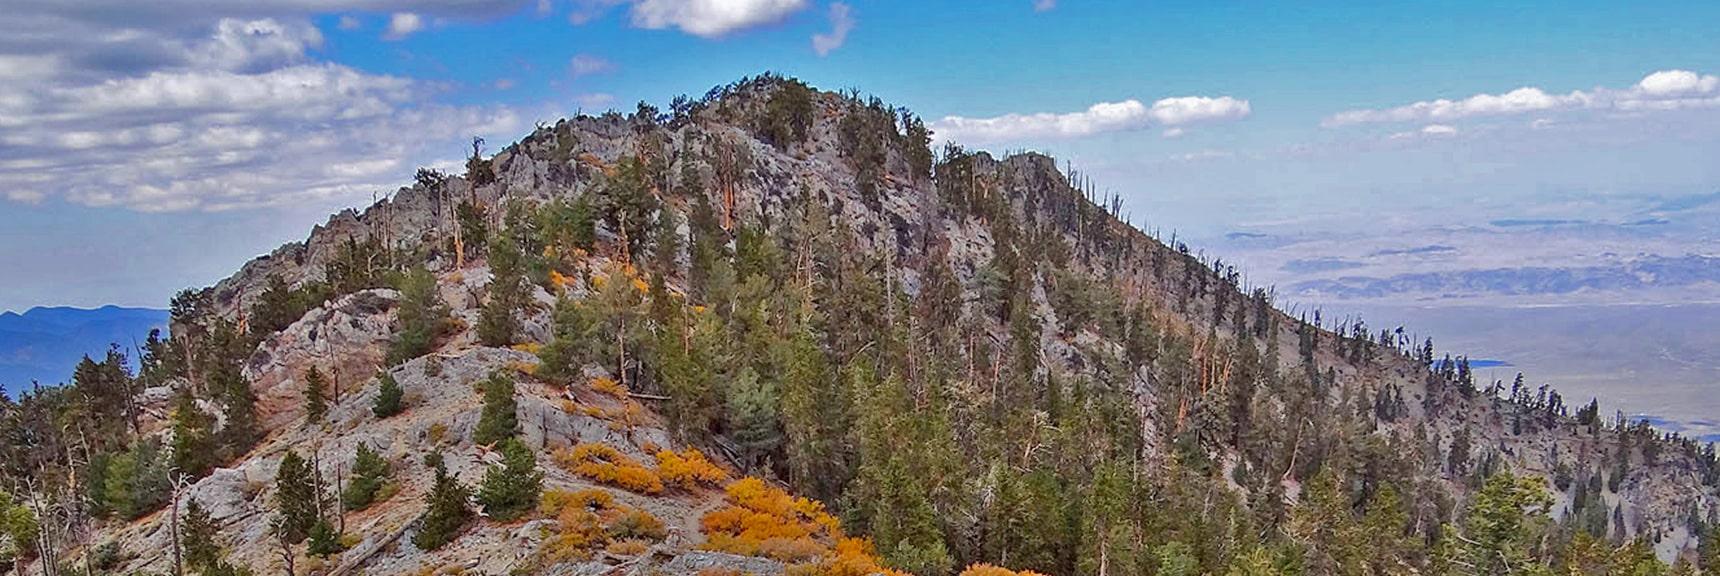 Placeholder | Bonanza Peak | Lee Canyon | Spring Mountains | Nevada